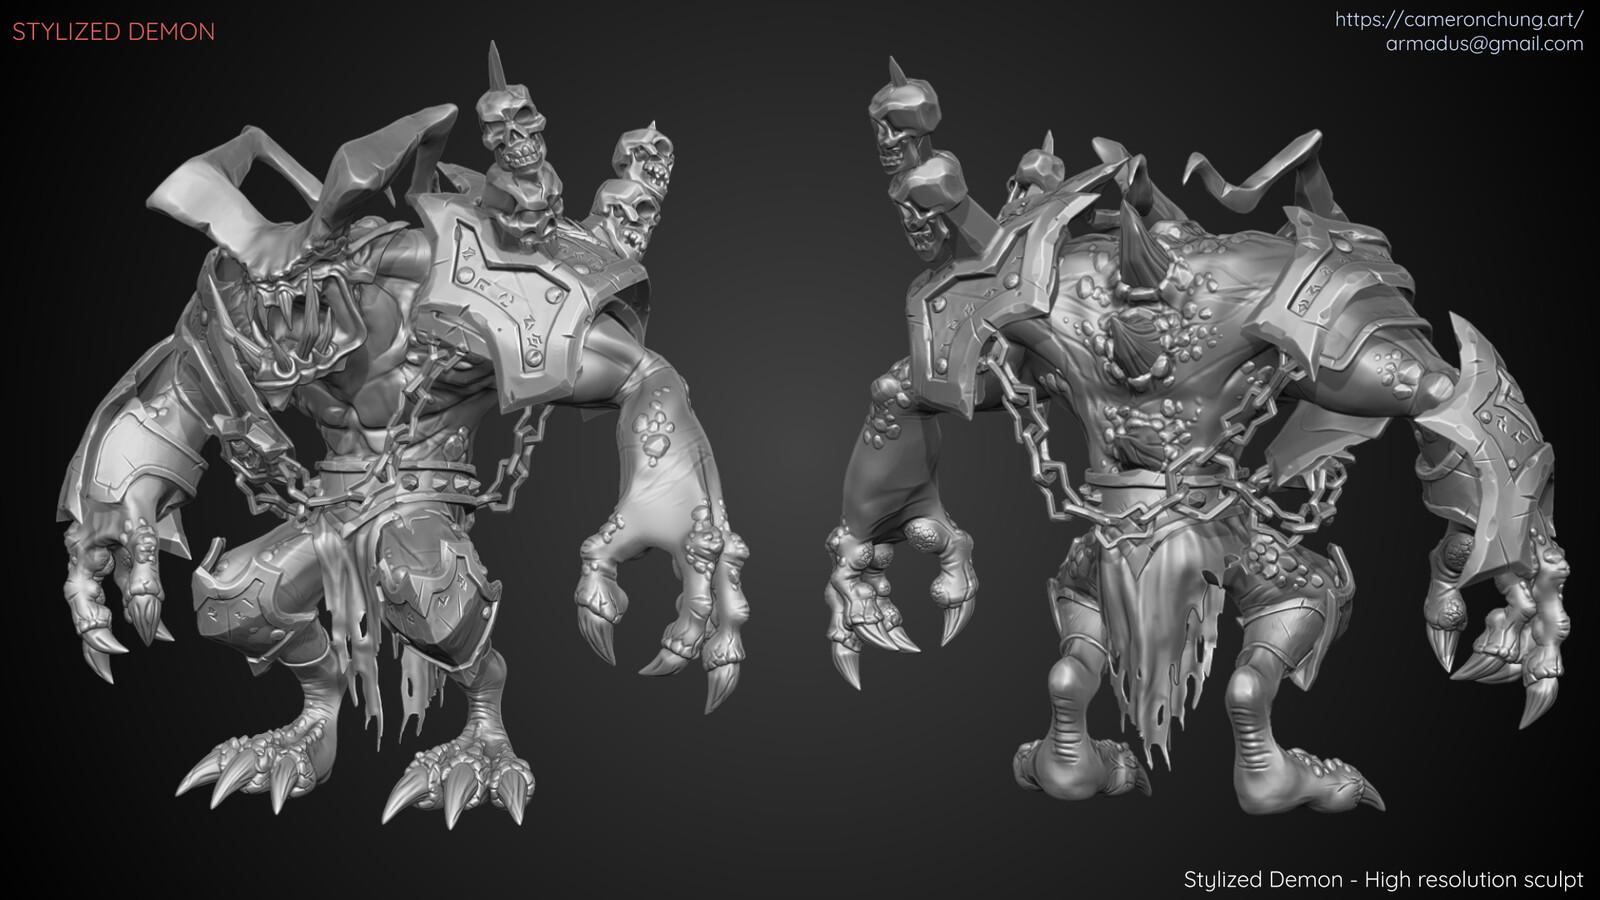 Stylized Demon - Zbrush sculpt